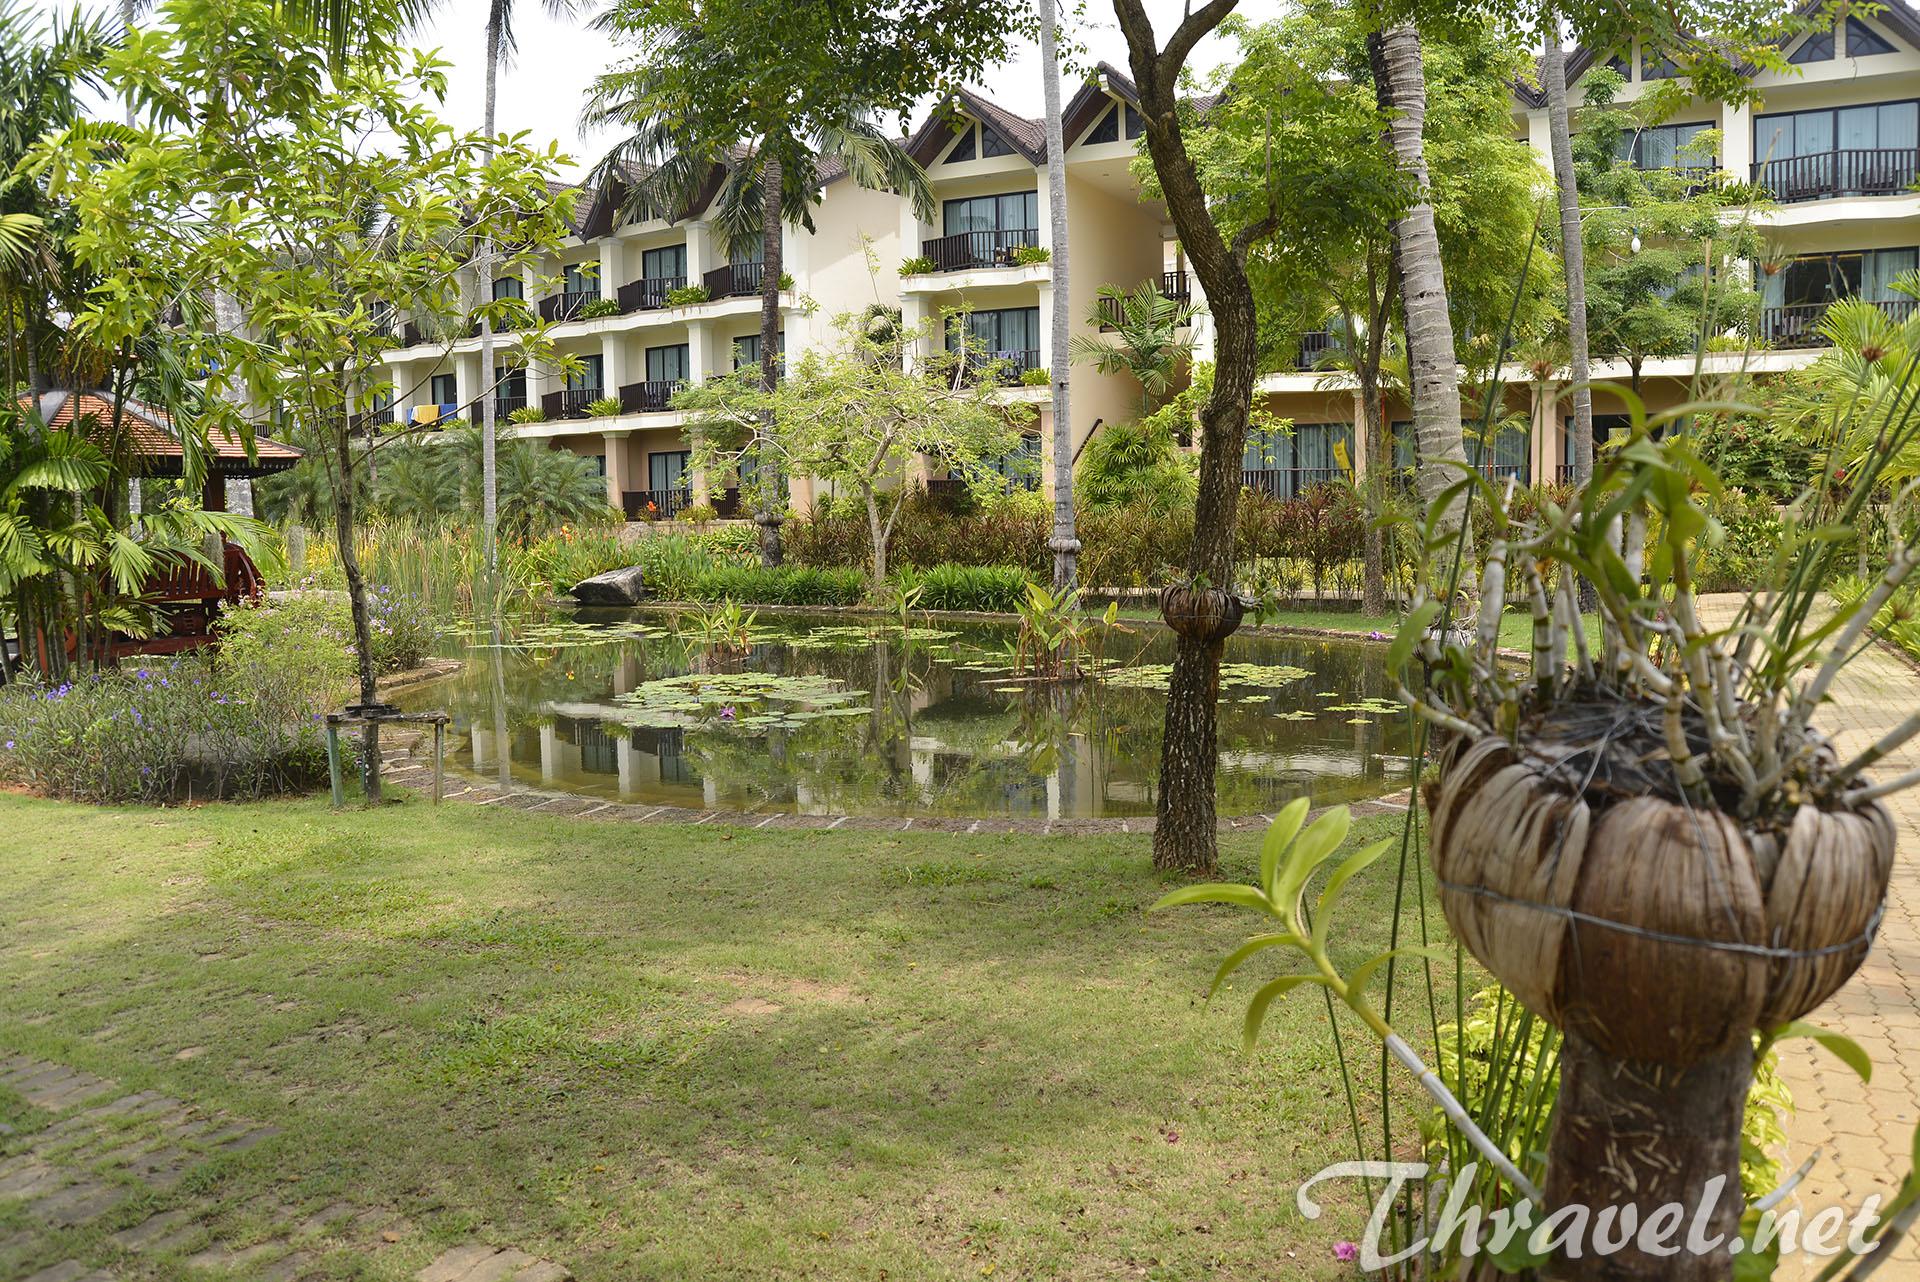 duangjitt-resort-and-spa-hotel-patong-beach-phuket-thailand-25